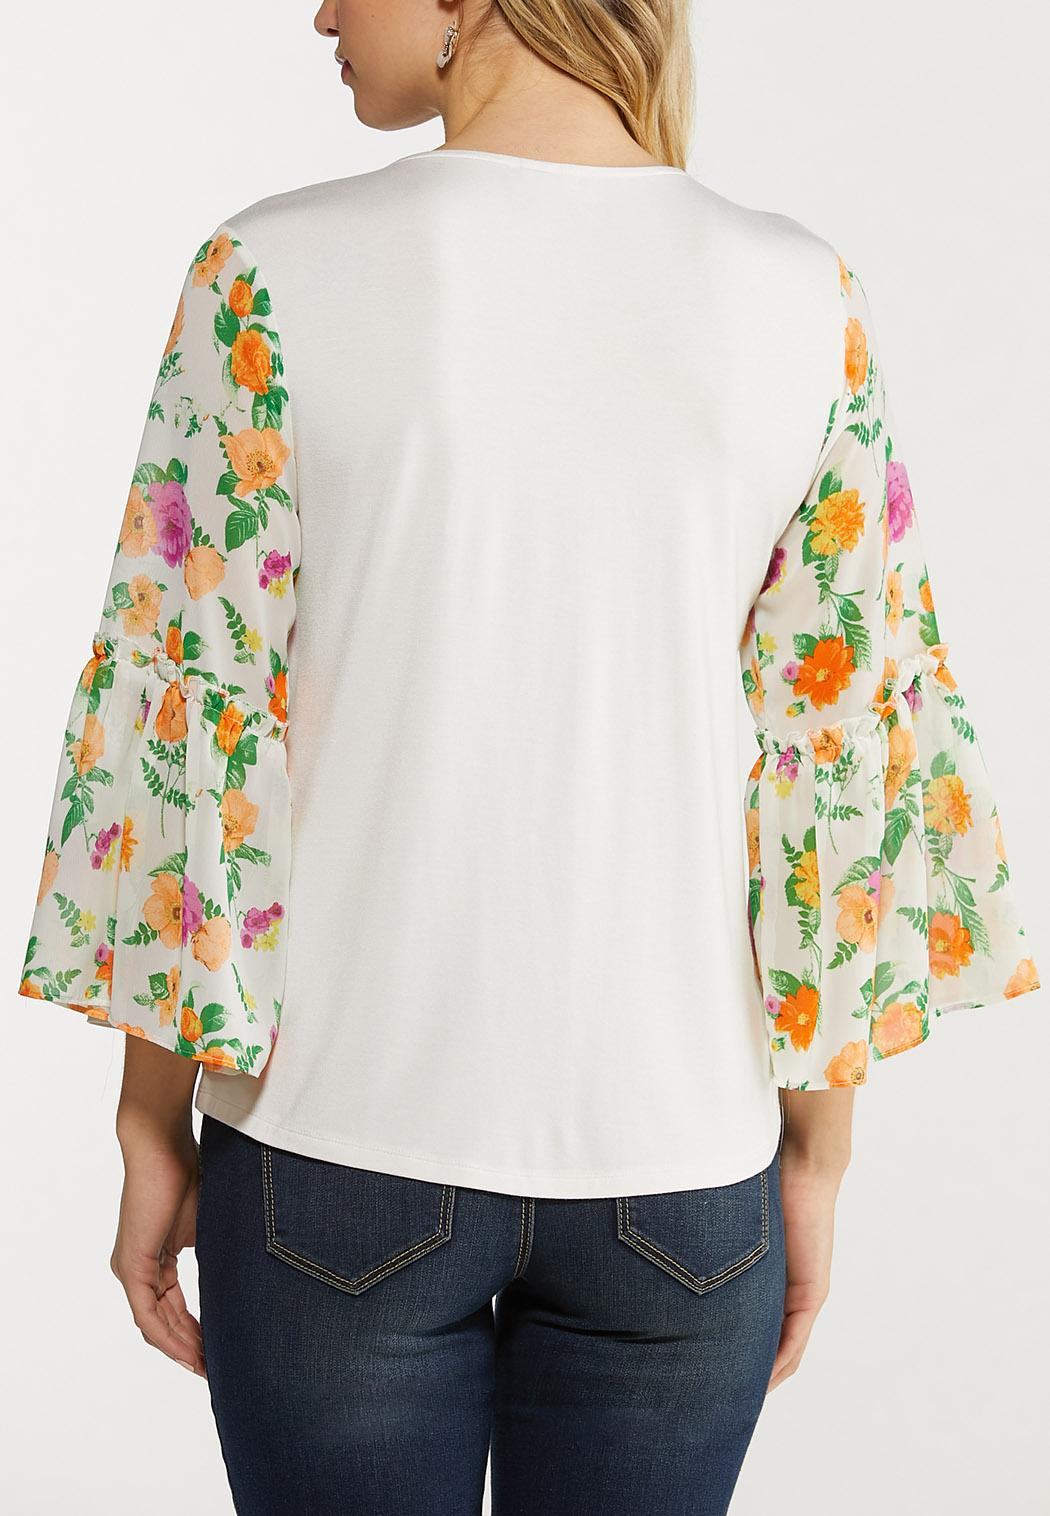 Plus Size Chiffon Floral Sleeve Top (Item #44515637)